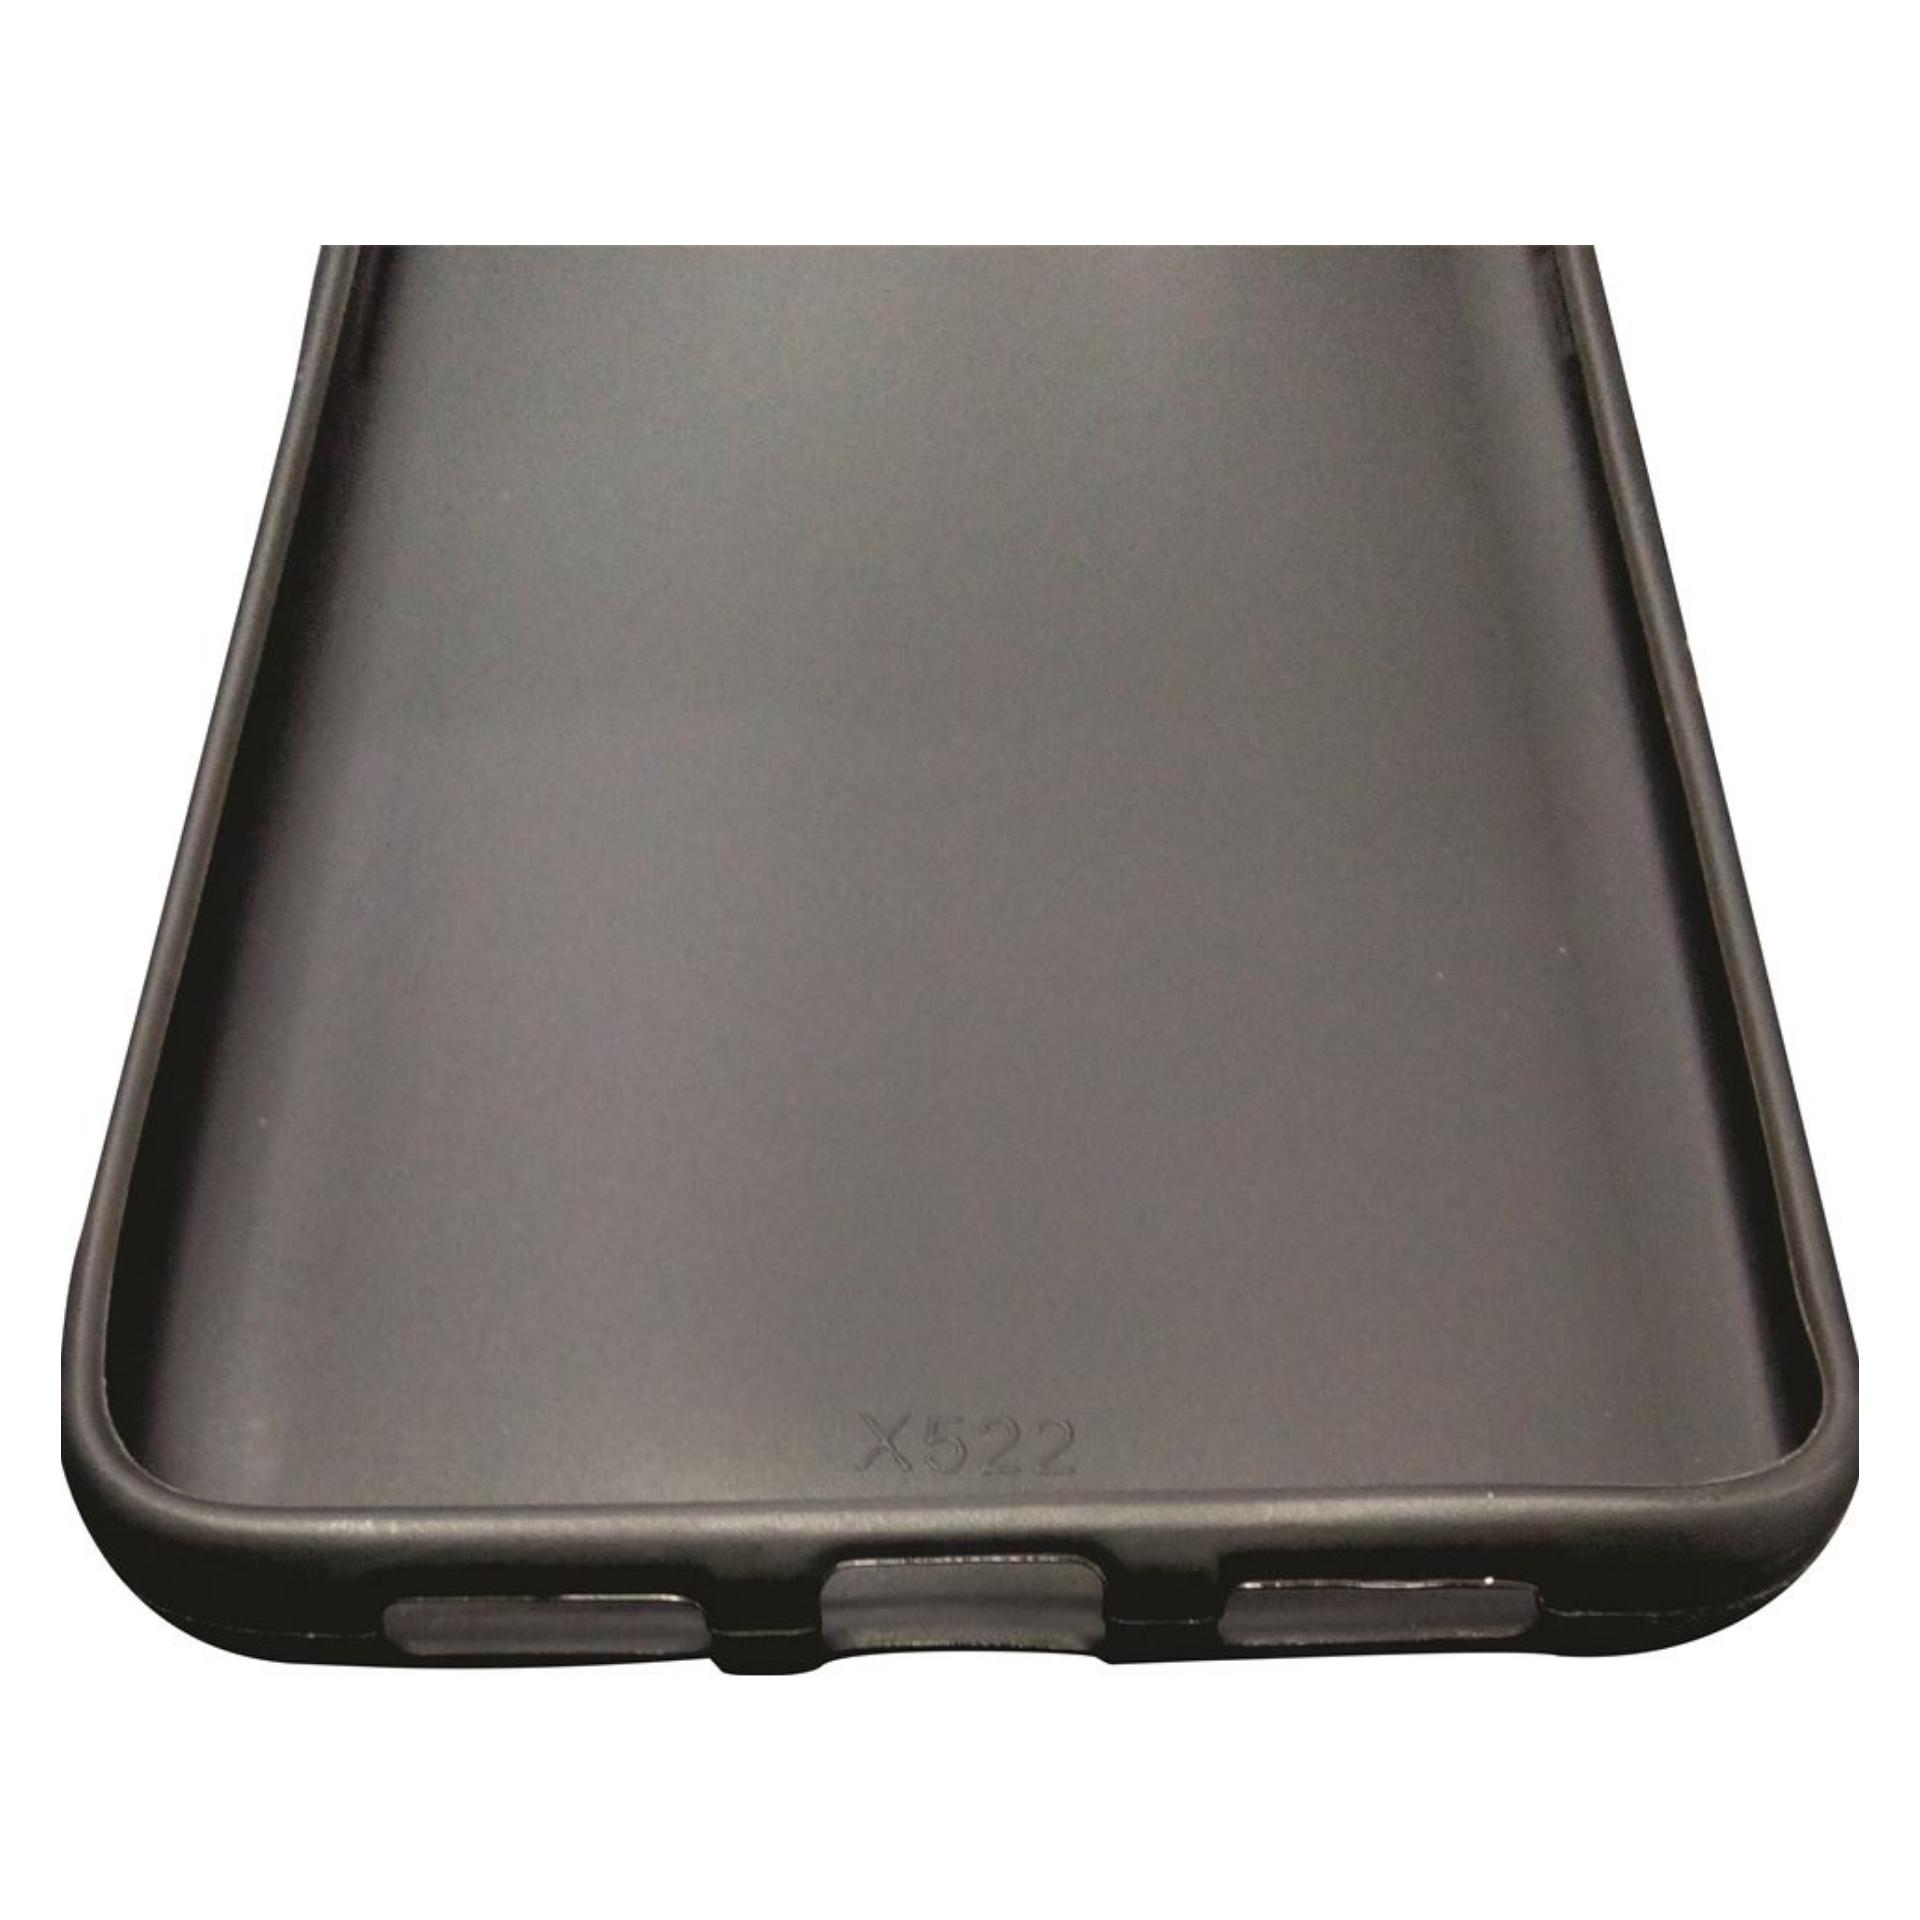 Cek Harga Baru Softcase Infinix S2 Pro X 522 Black Lichee Case Armor Hot 4 X556 3